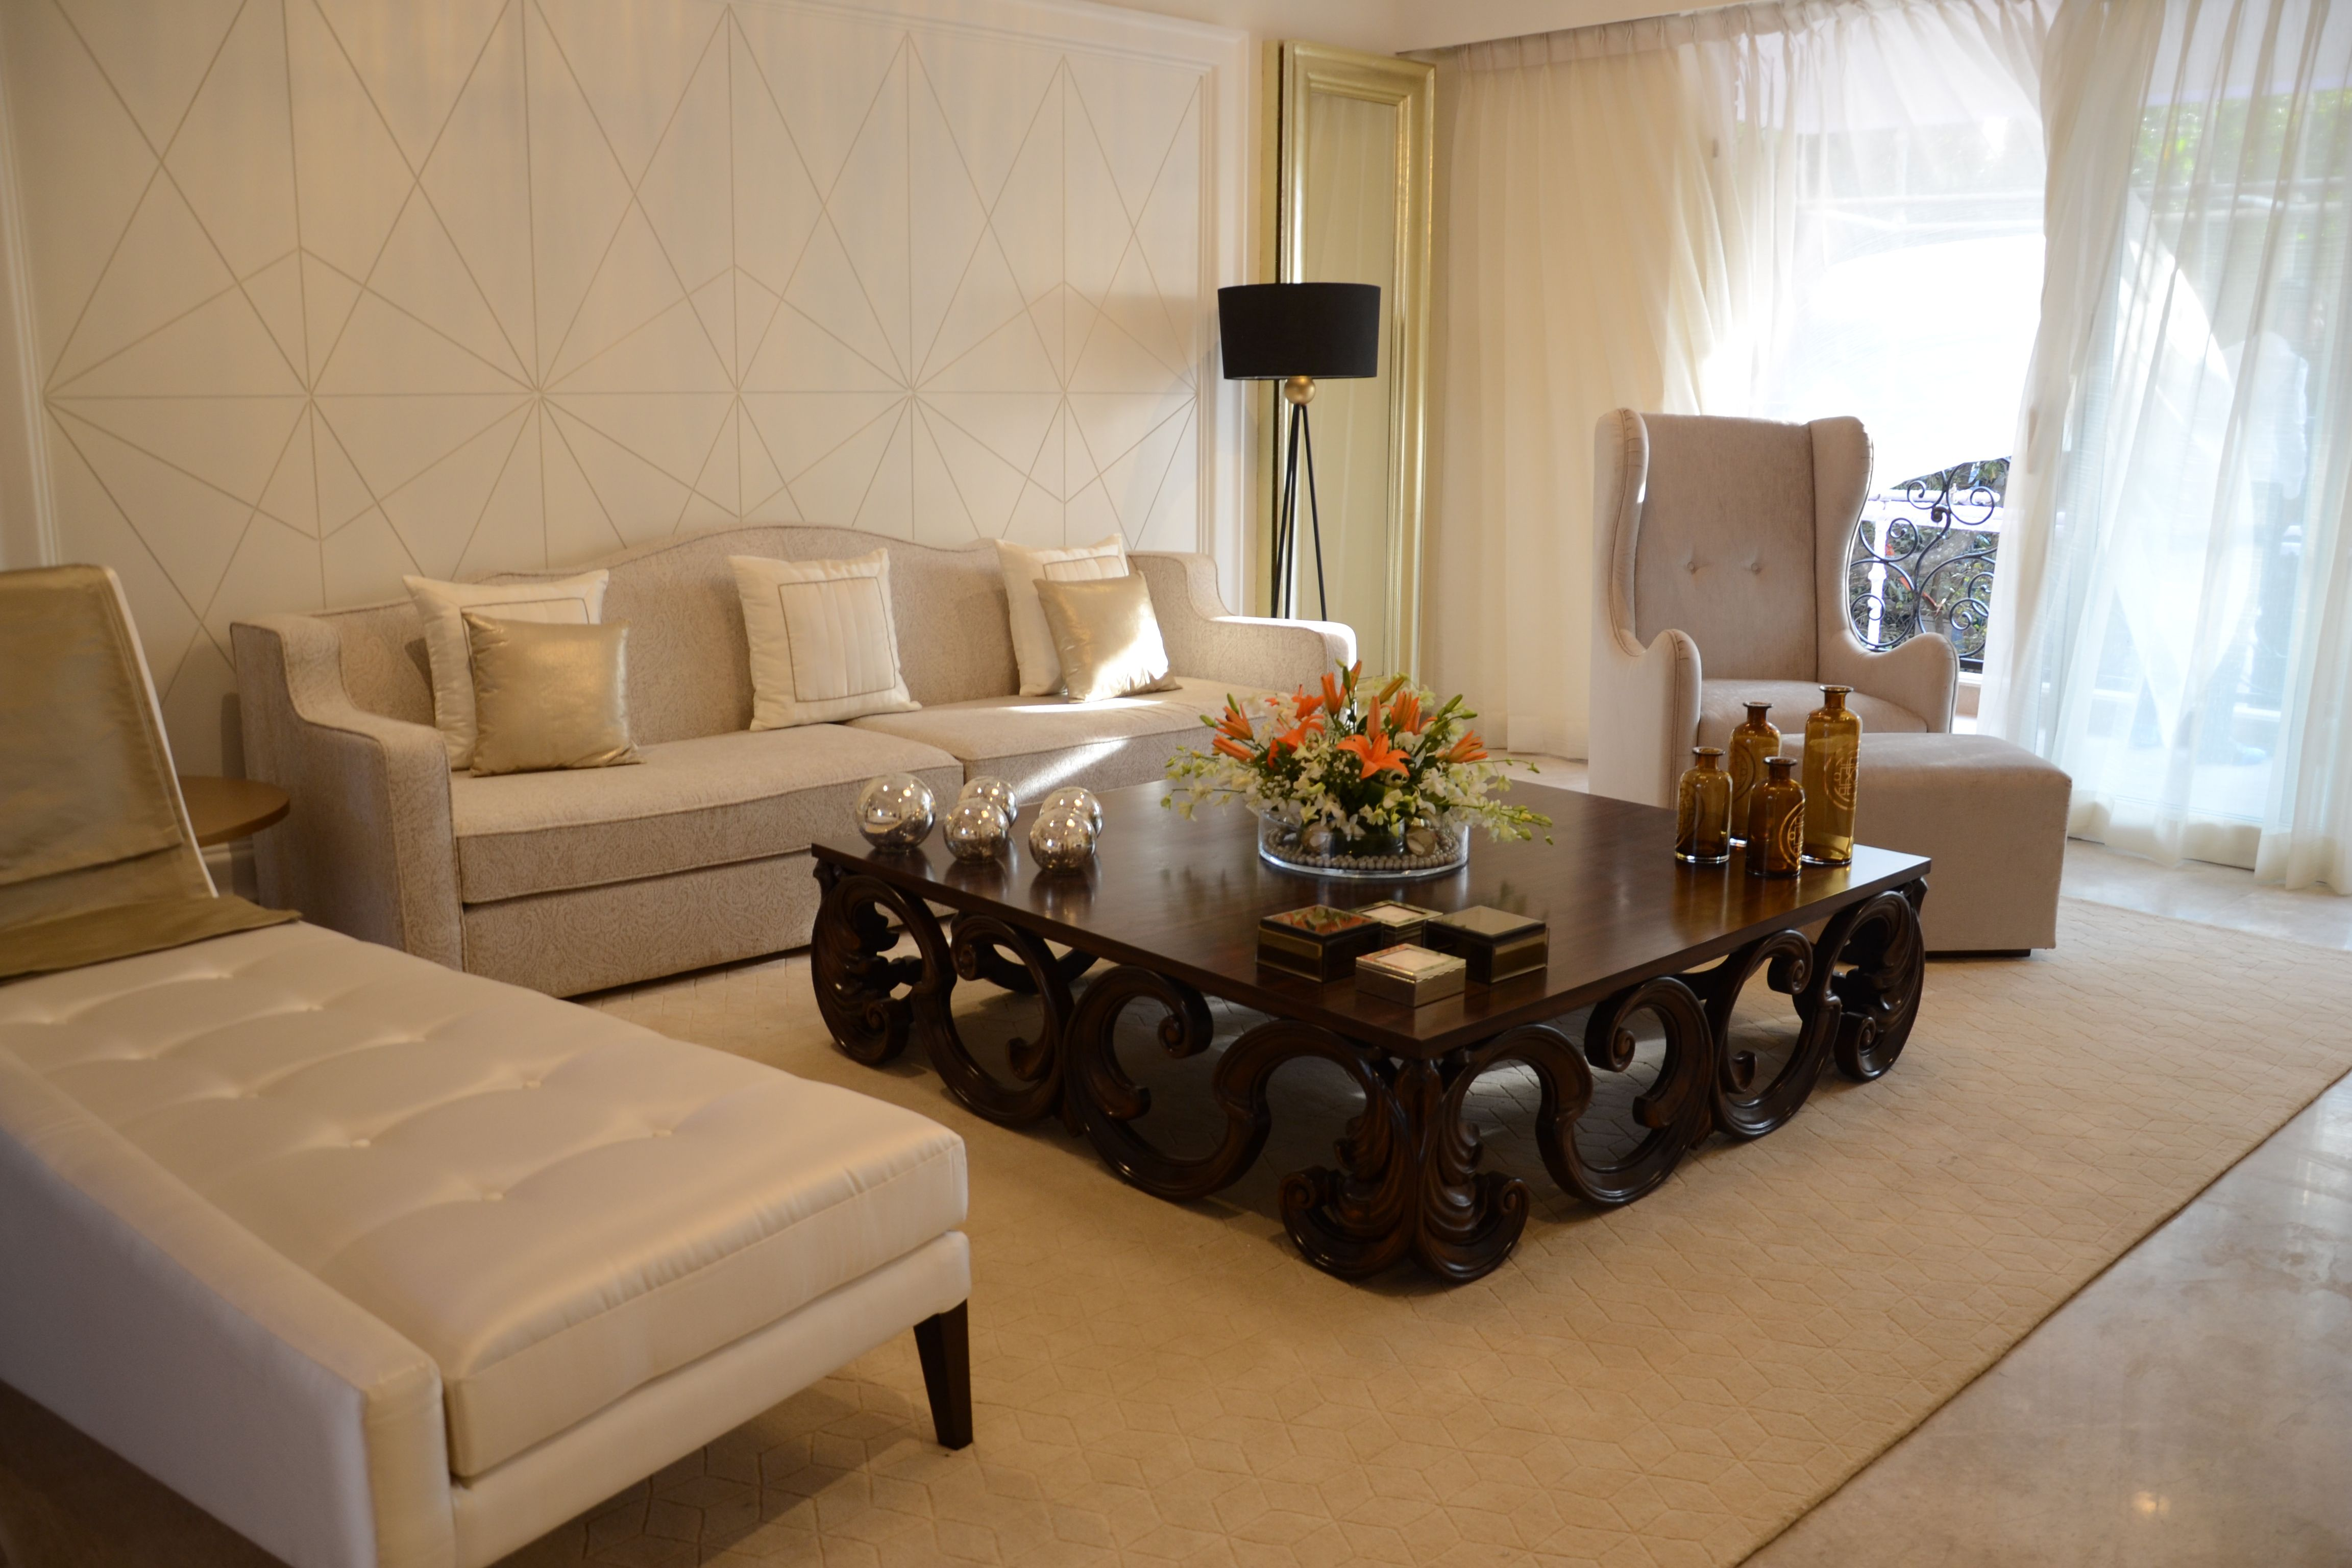 House tour prestige edwardian a luxury apartment part home and